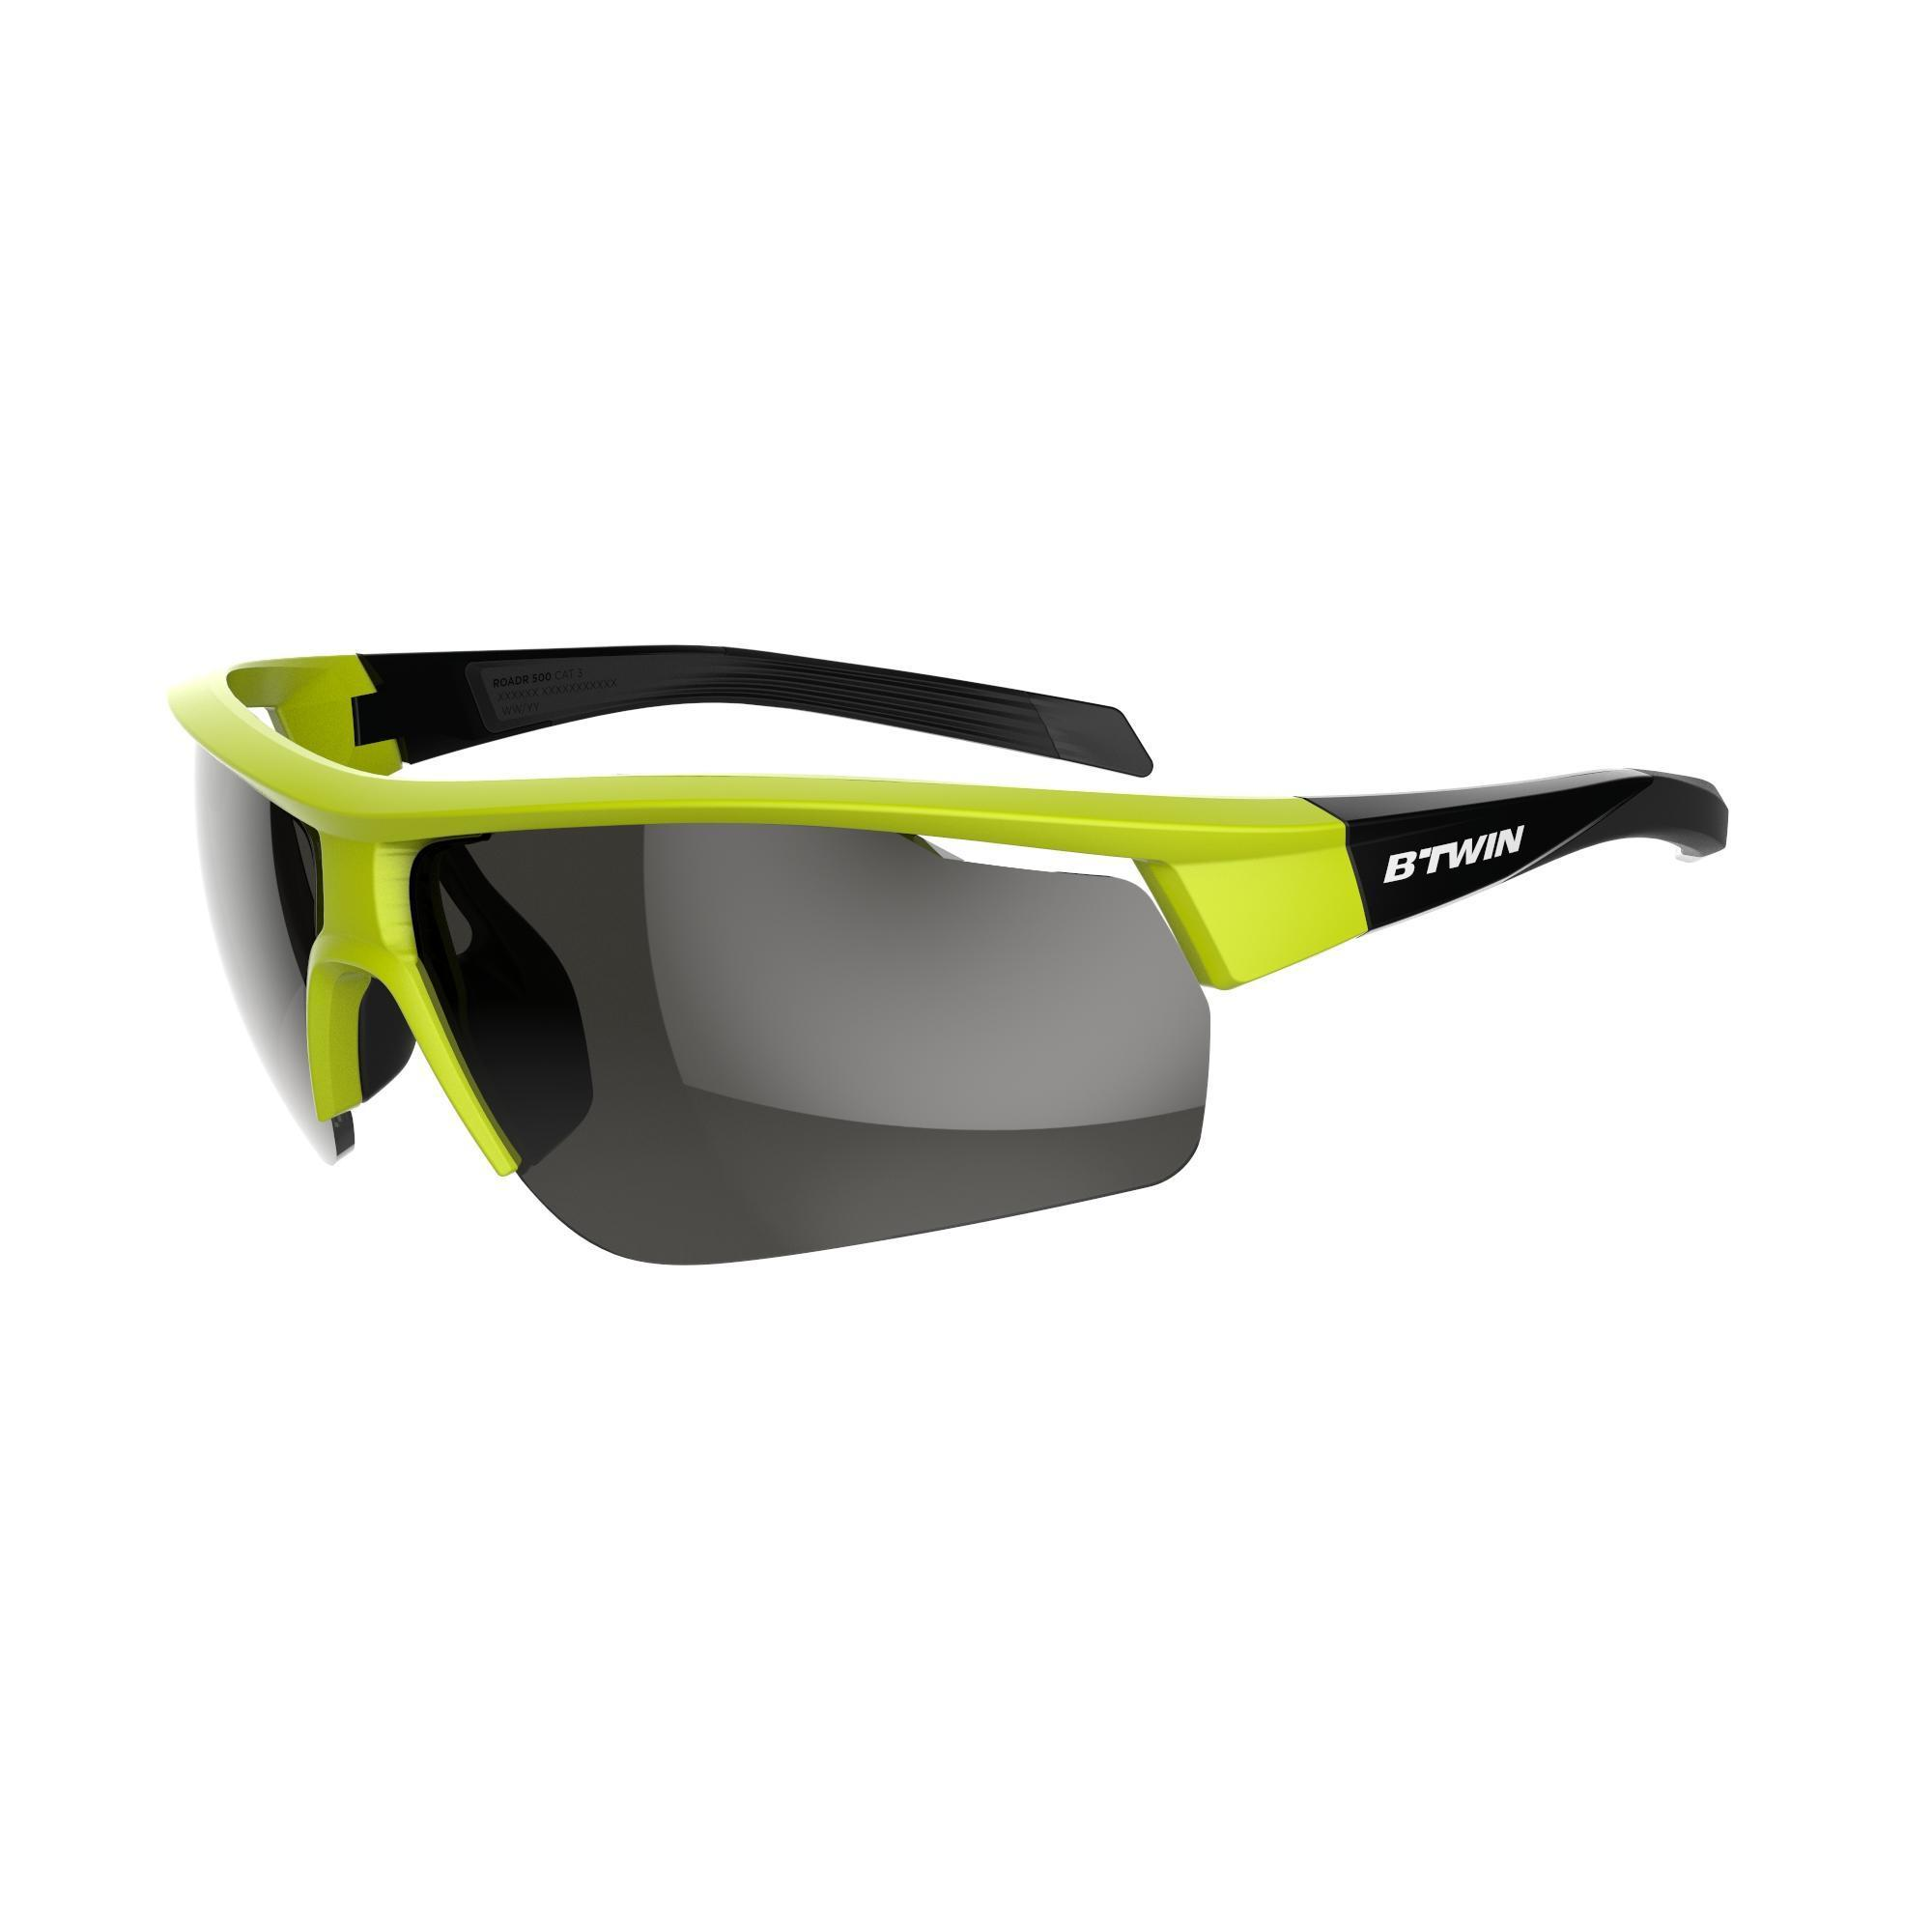 a0e9b80d20 Comprar Gafas de Ciclismo   Decathlon